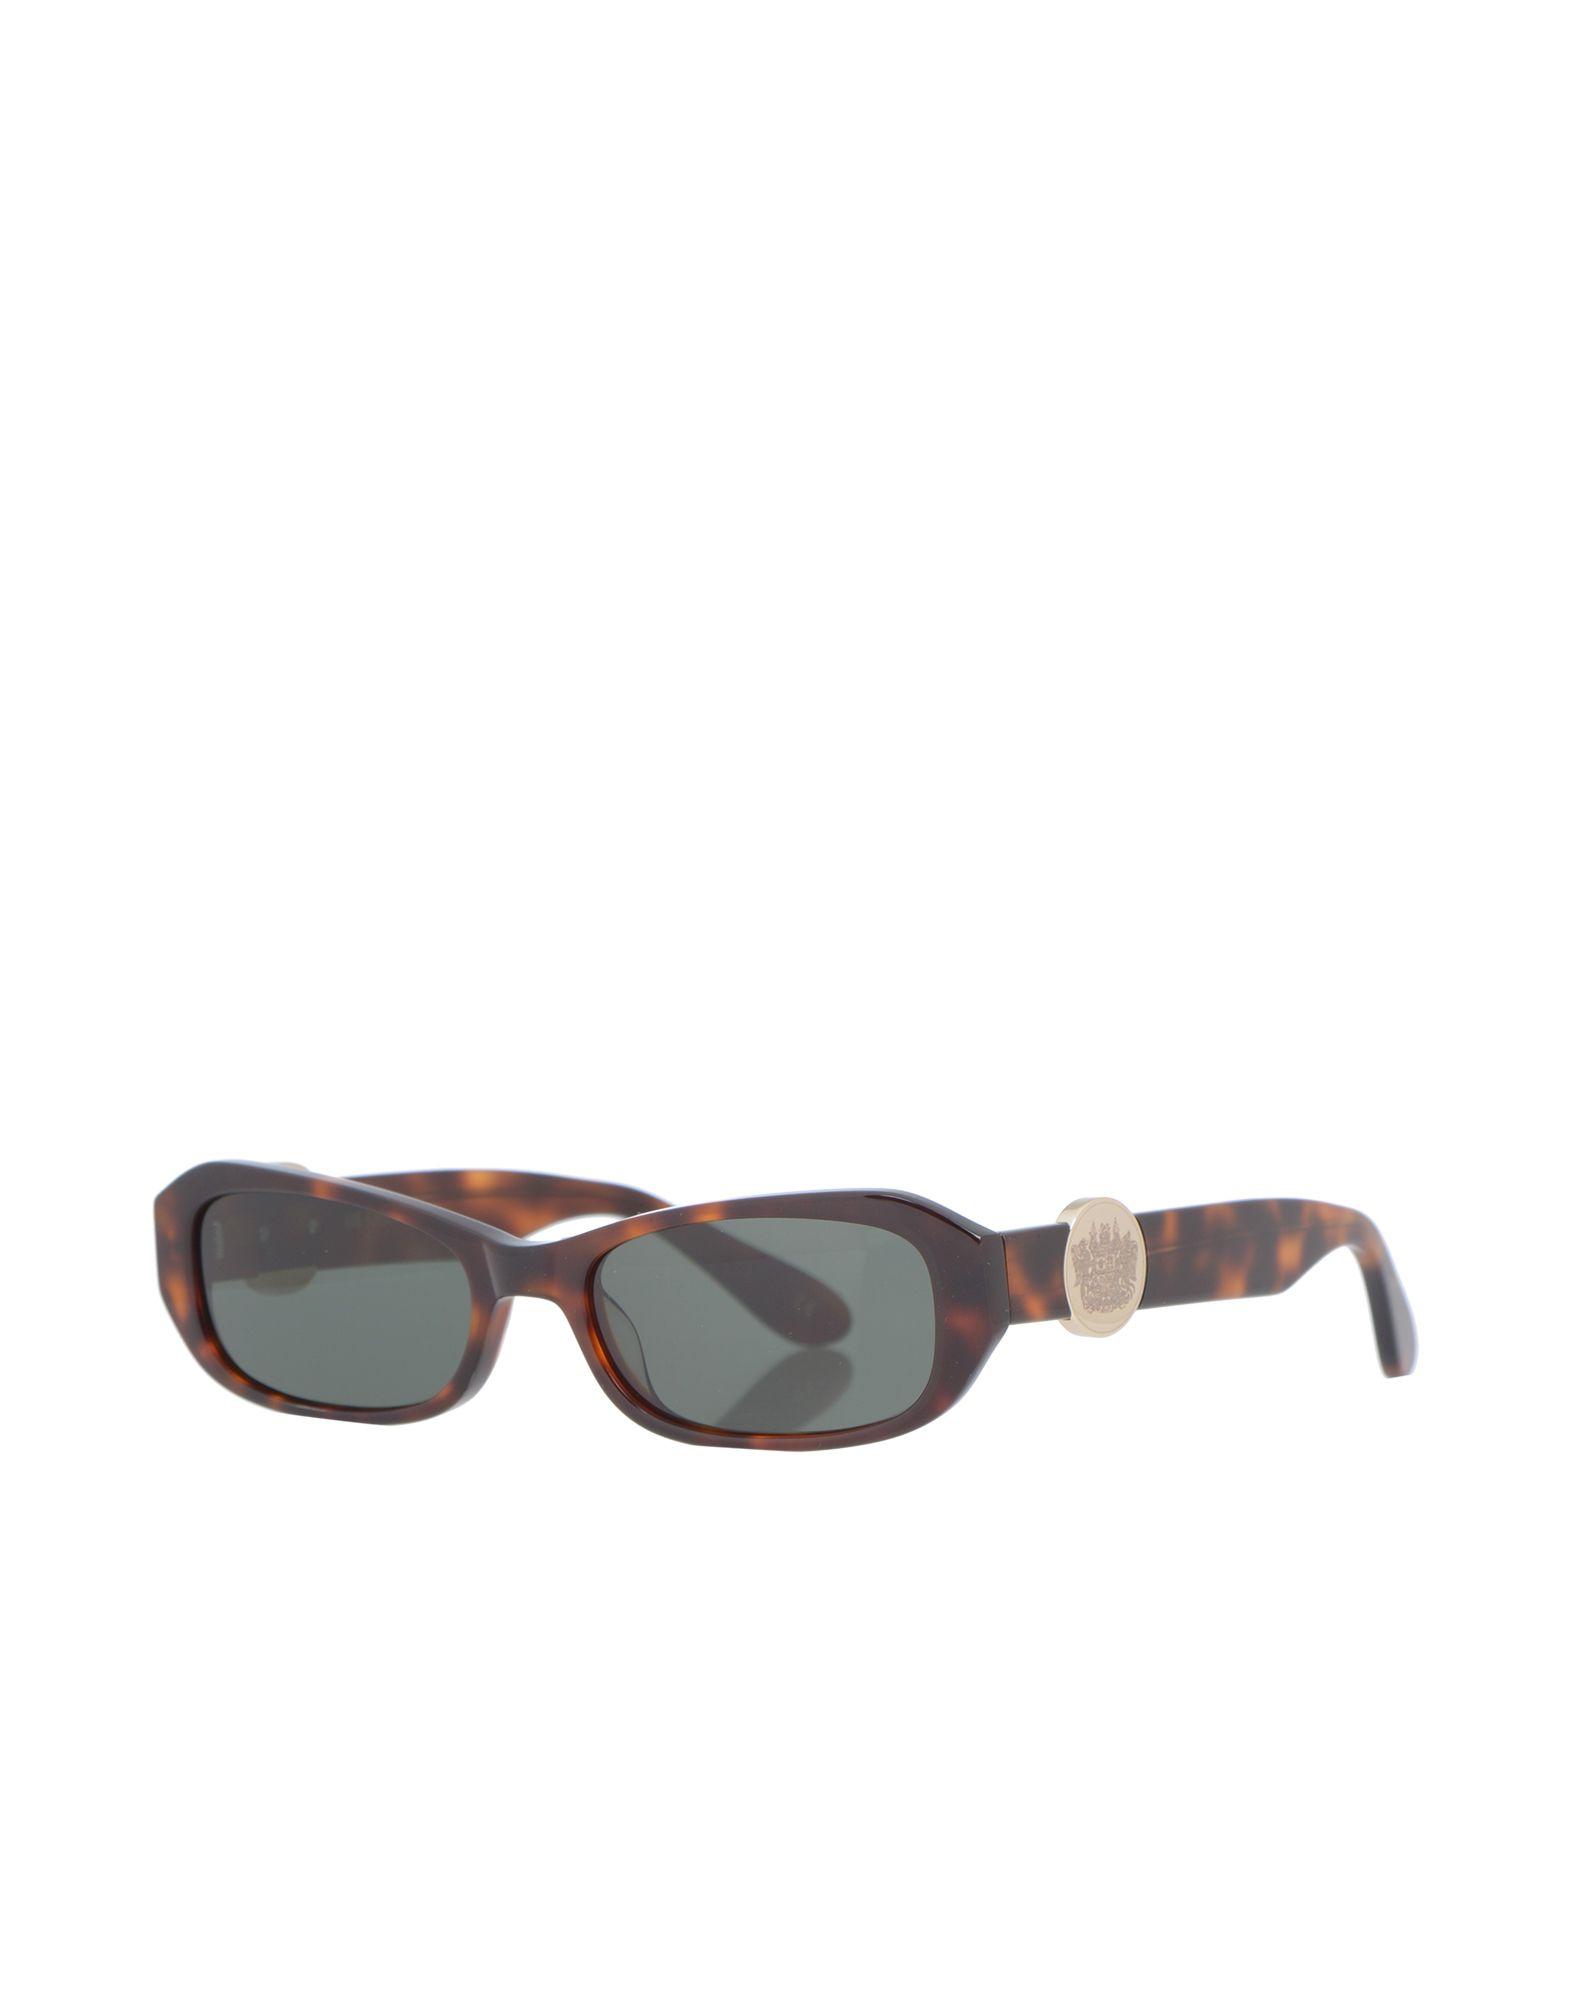 Фото - HAN KJØBENHAVN Солнечные очки 3d очки